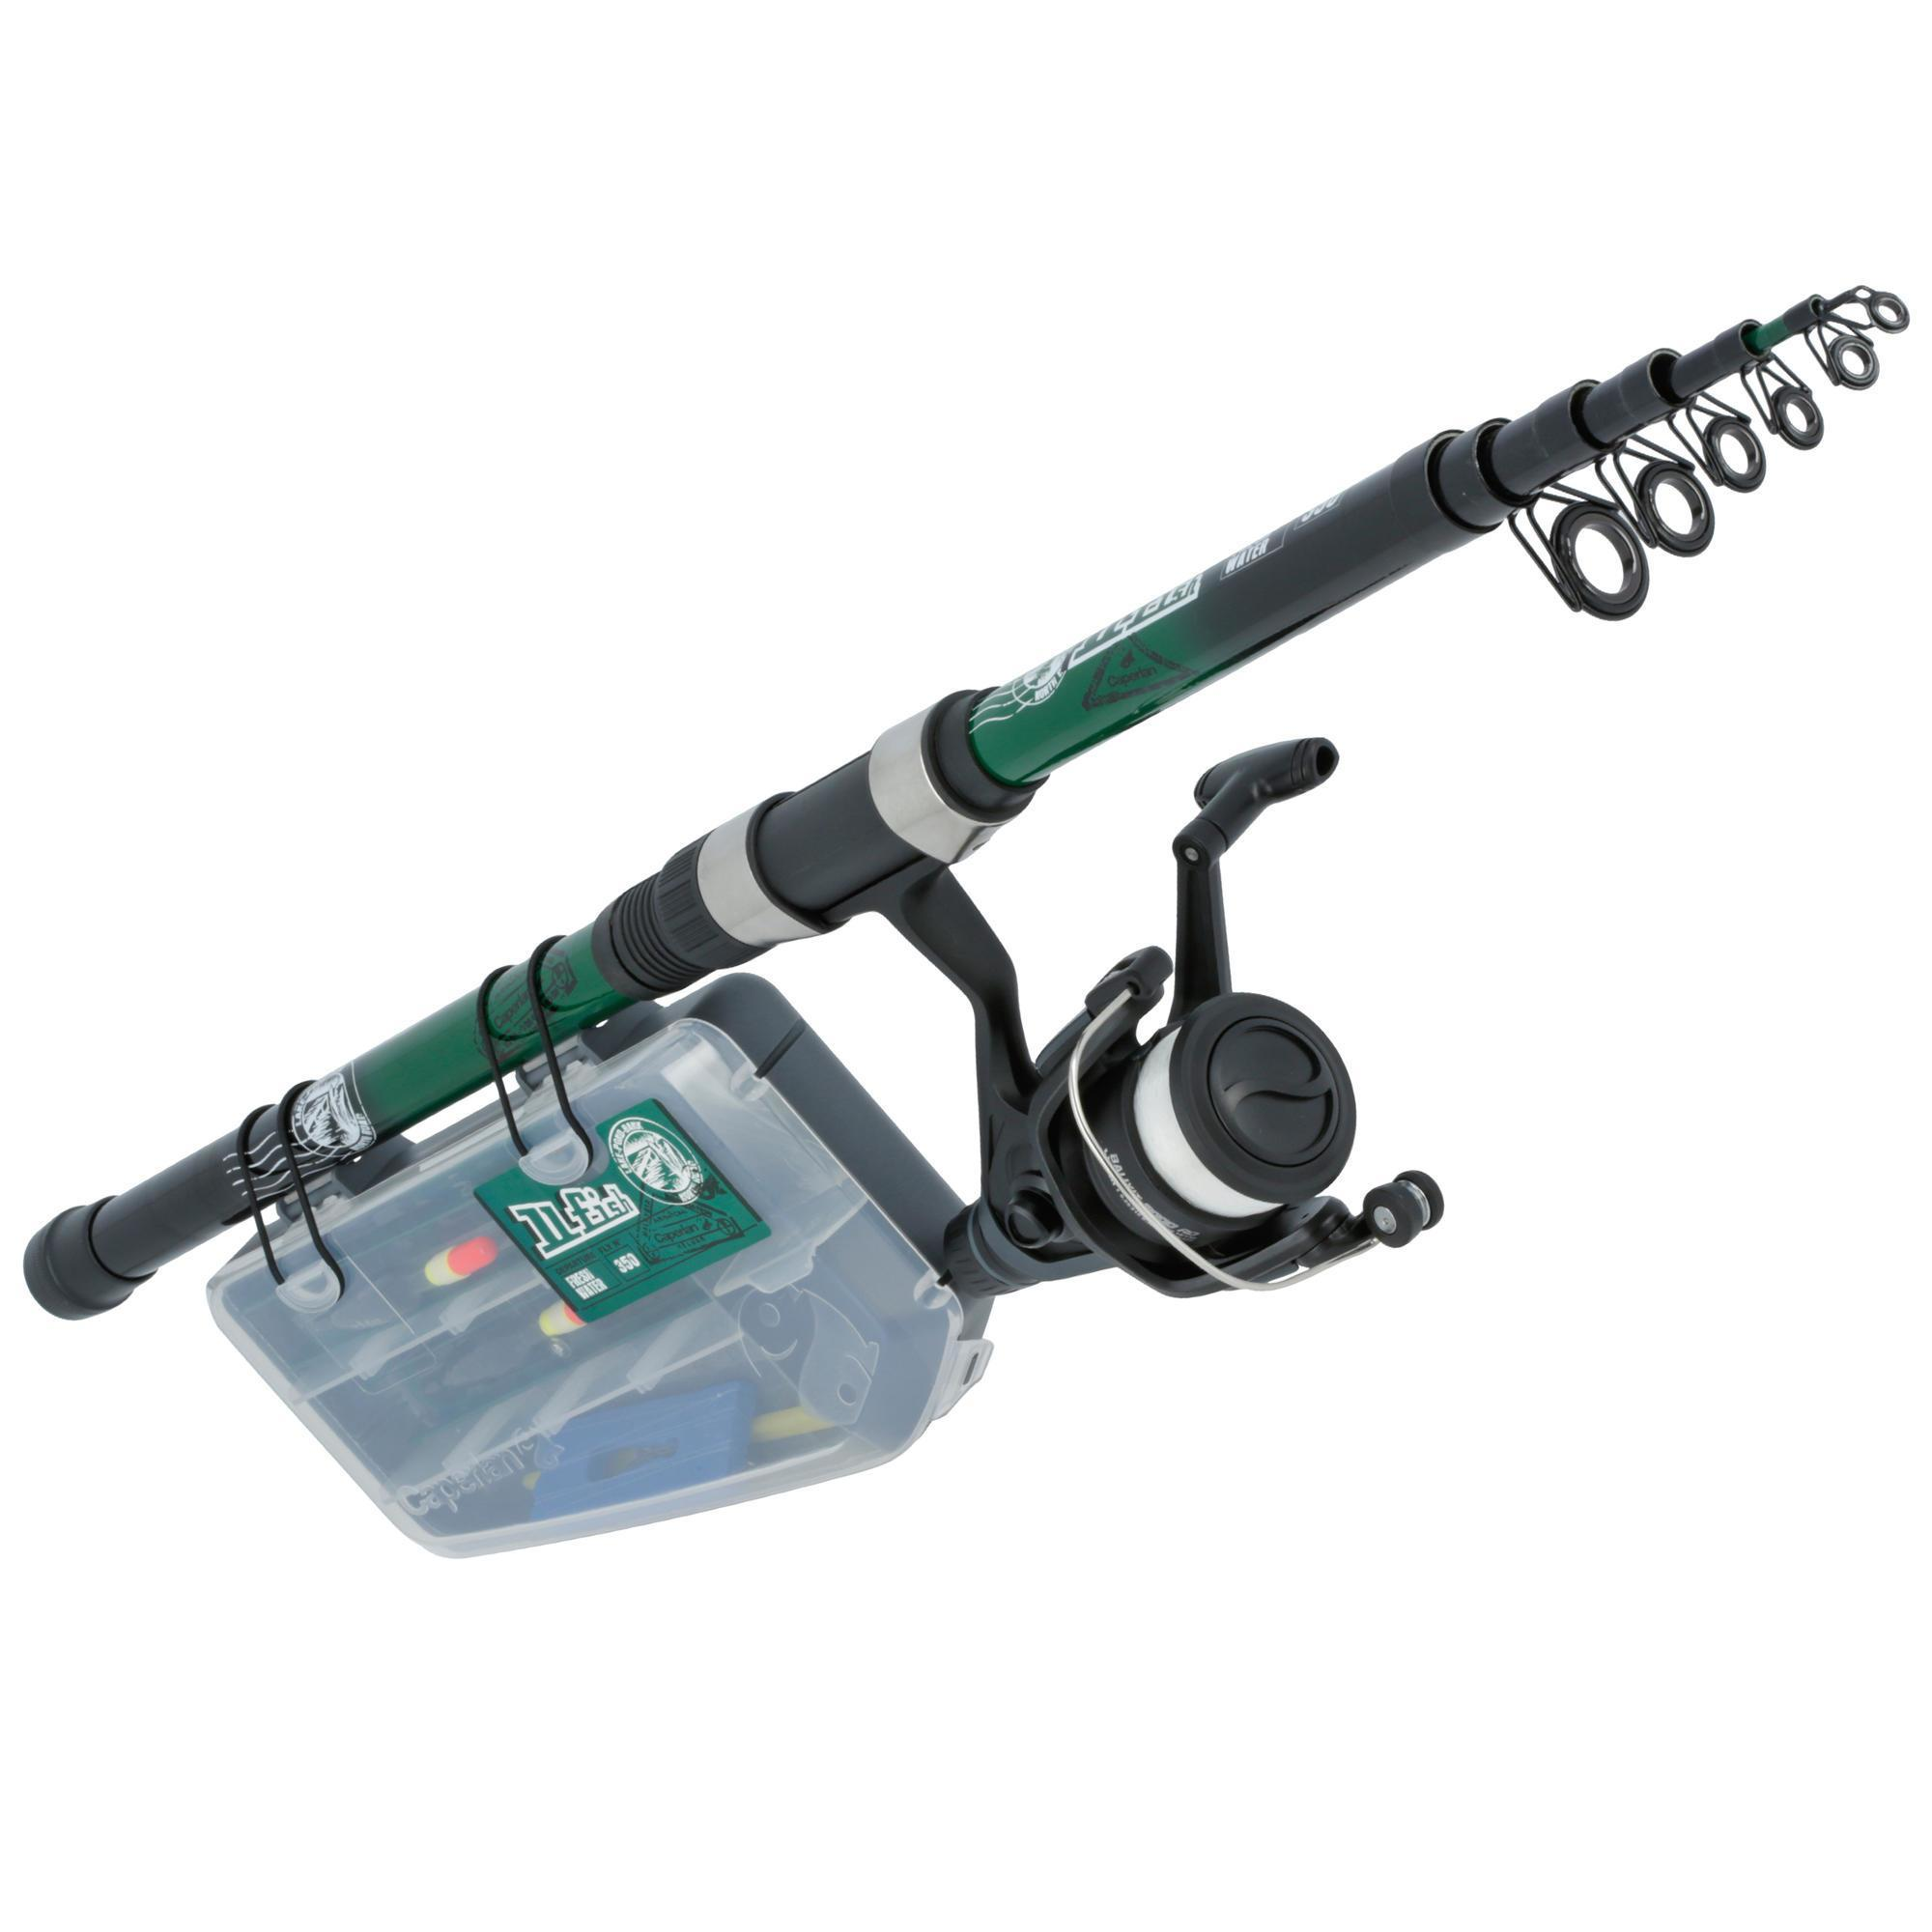 Caperlan Kennismakingsset hengelsport Ufish Freshwater 350 New